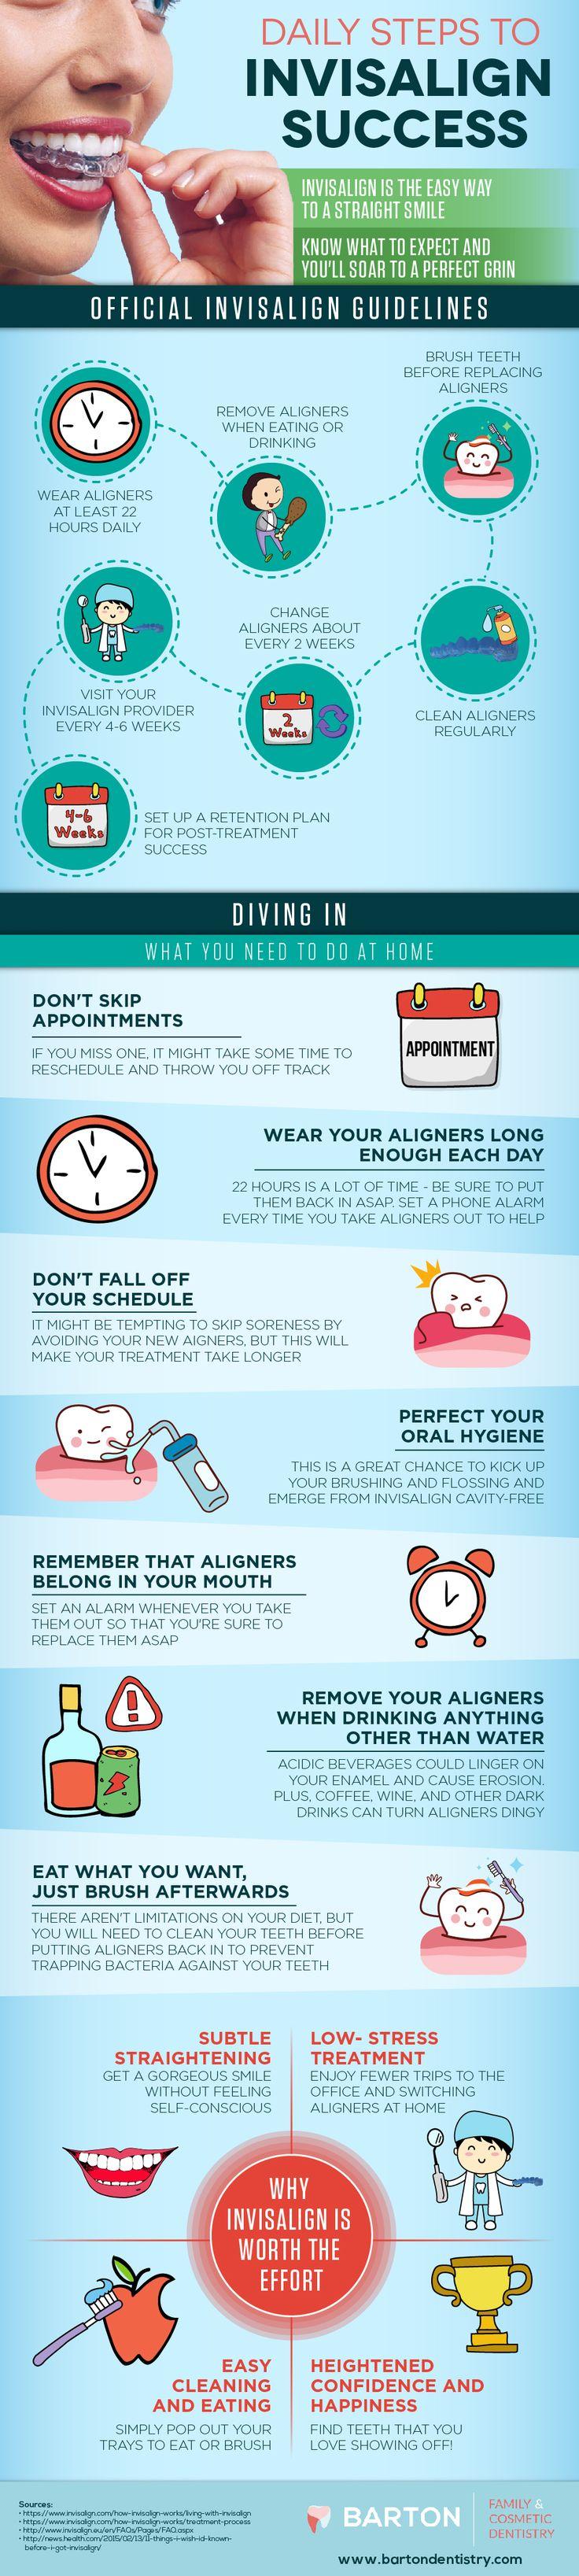 Secrets to Efficient Invisalign Treatment #invisalign #treatment #tips #easy